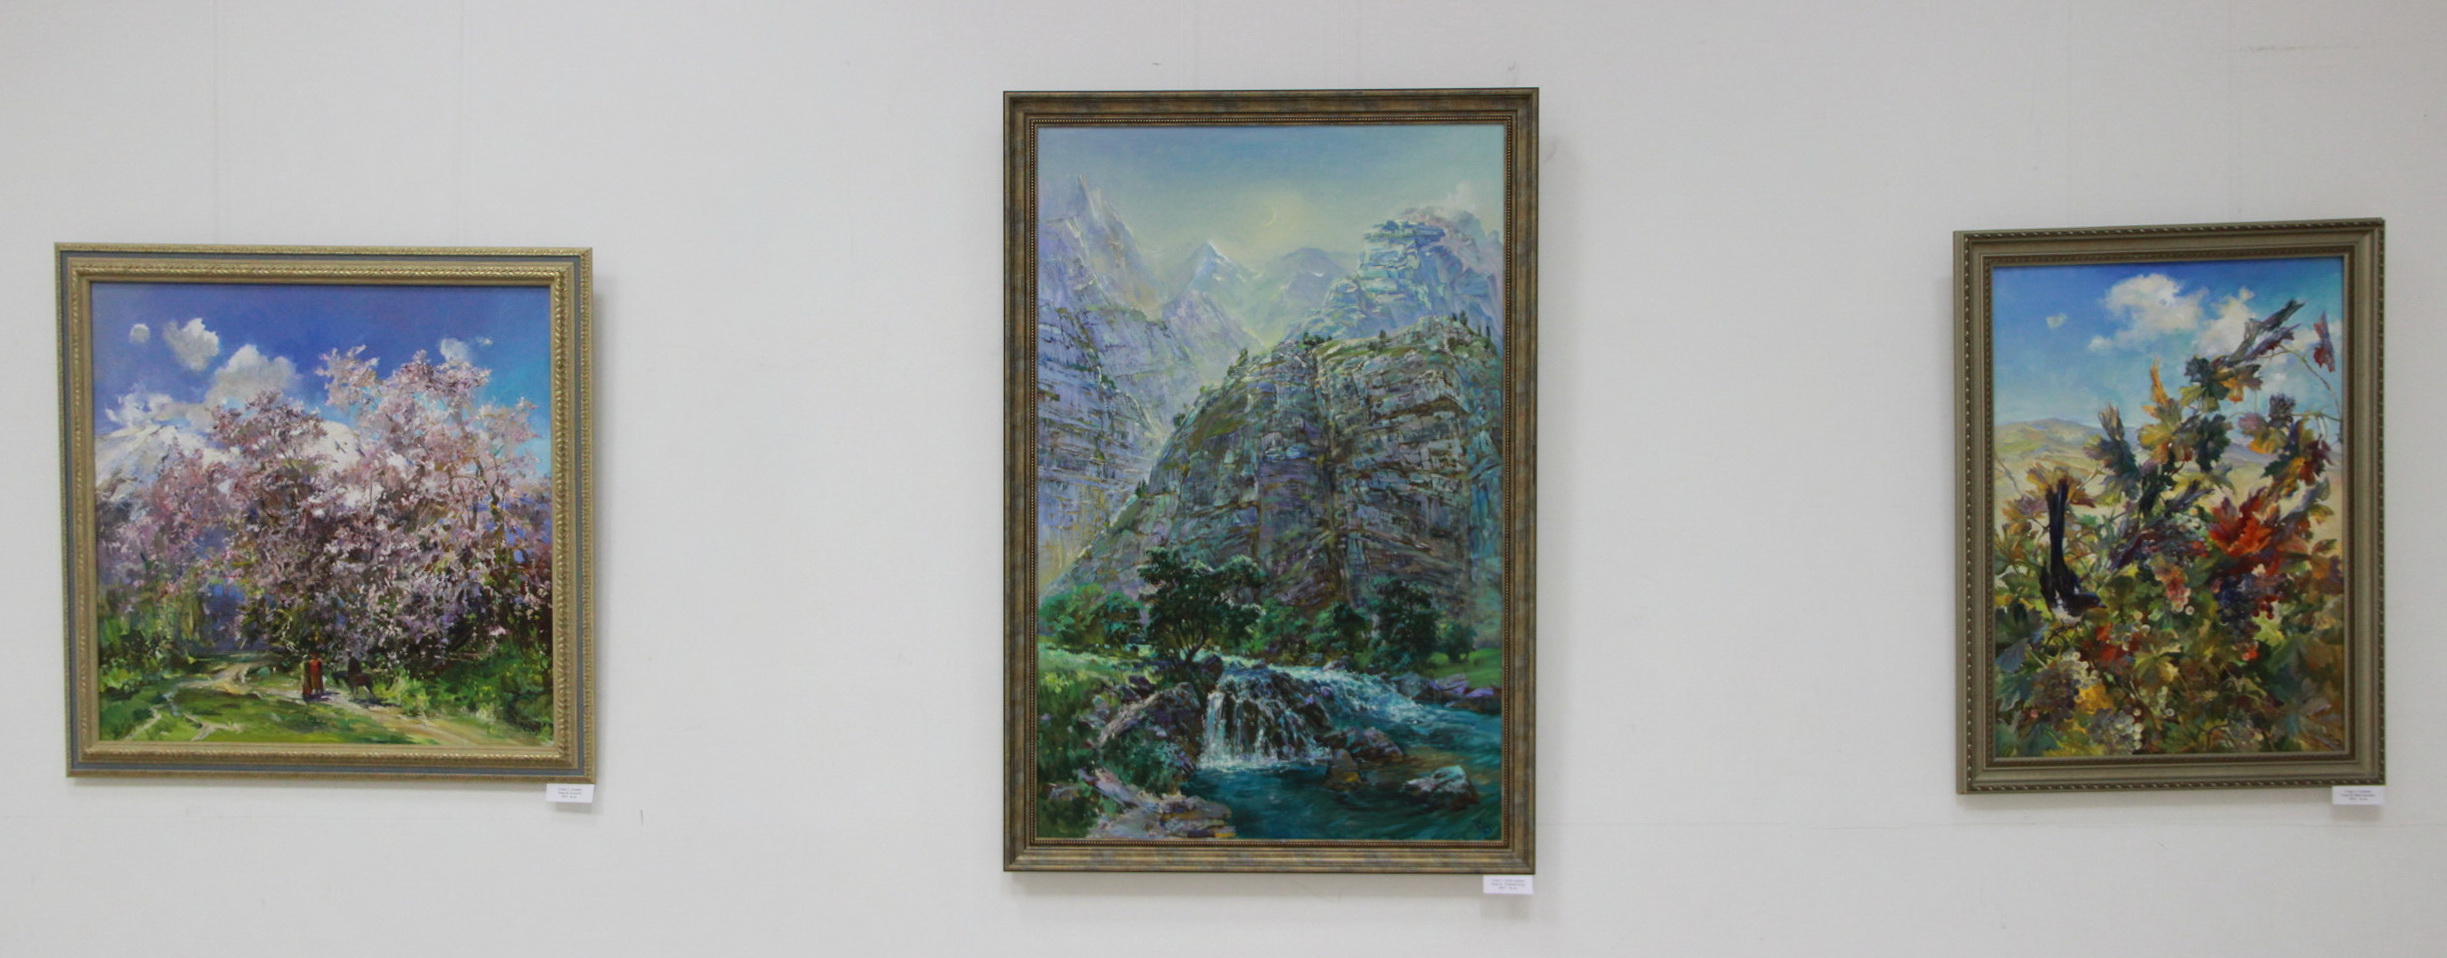 Экспозиция картин Валерия Енина